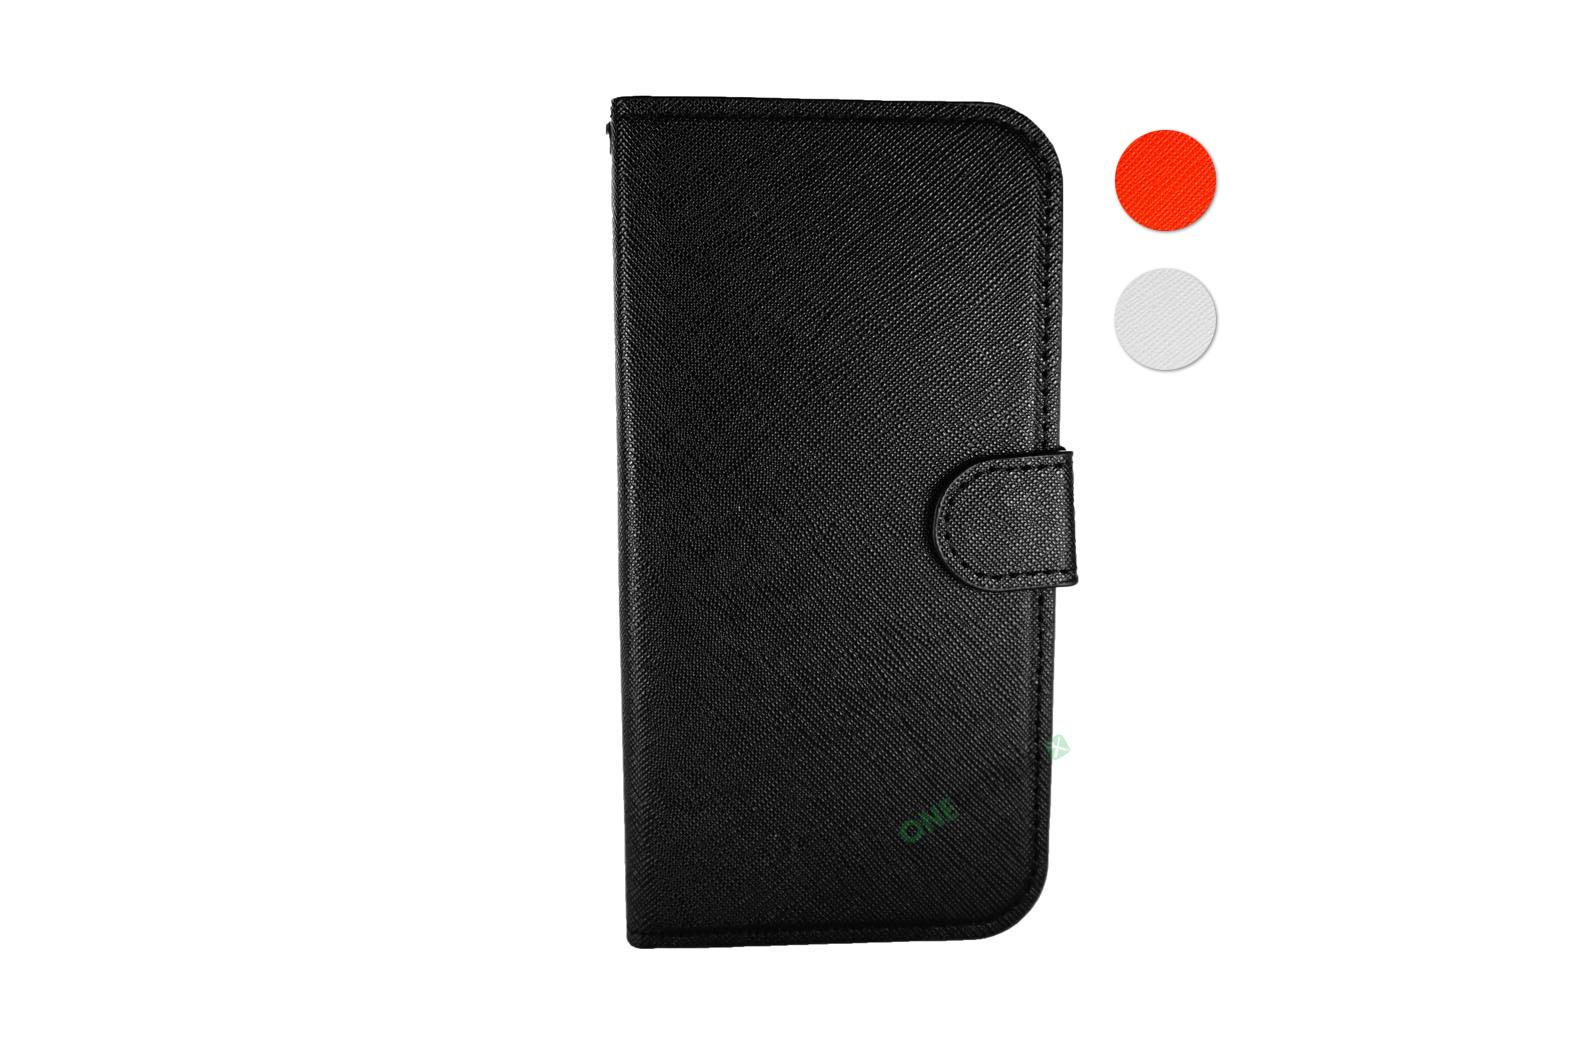 353703-001-2-3_iPhone_11_Flipcover_med_magnet_Plads_til_kort_Sort_Cover_OneRepair_00001